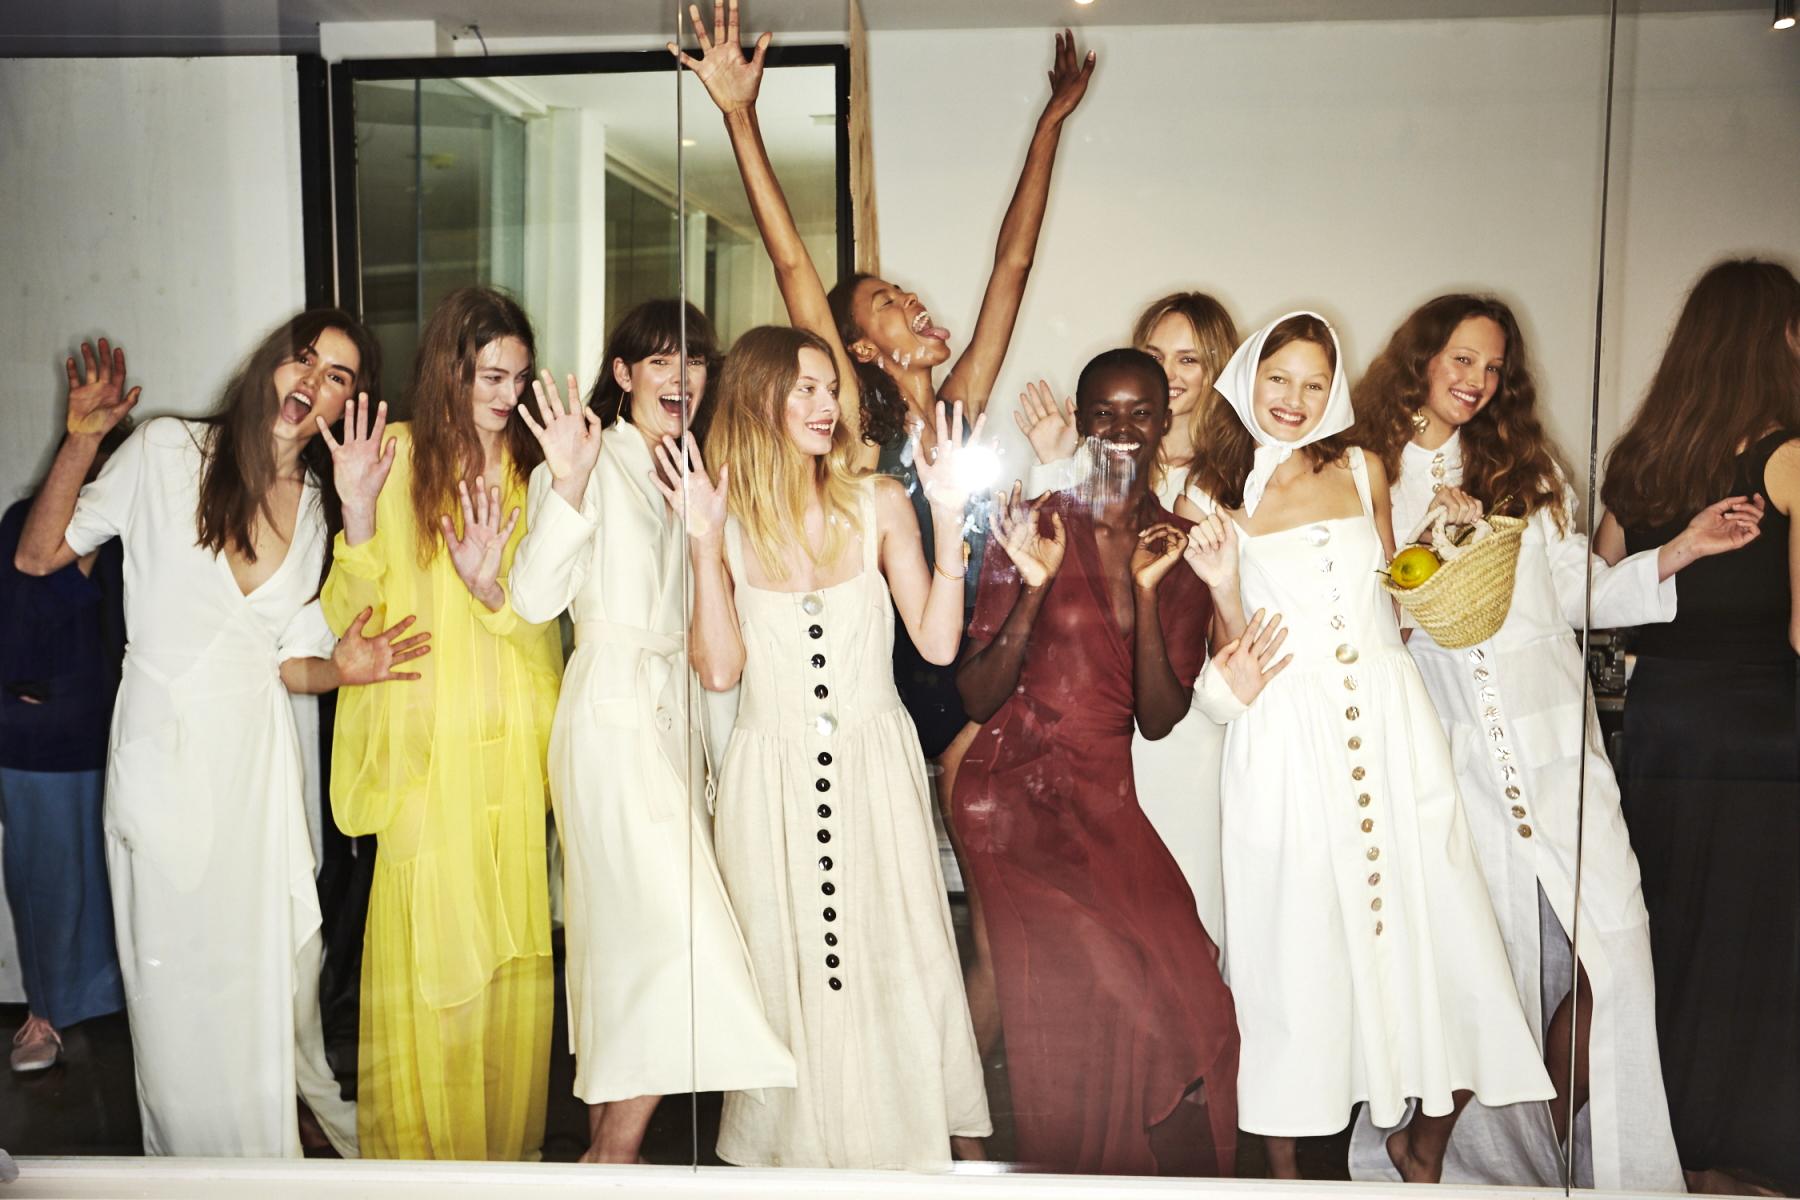 Albus Lumen Resort 2018 Fashion Show Sydney Backstage